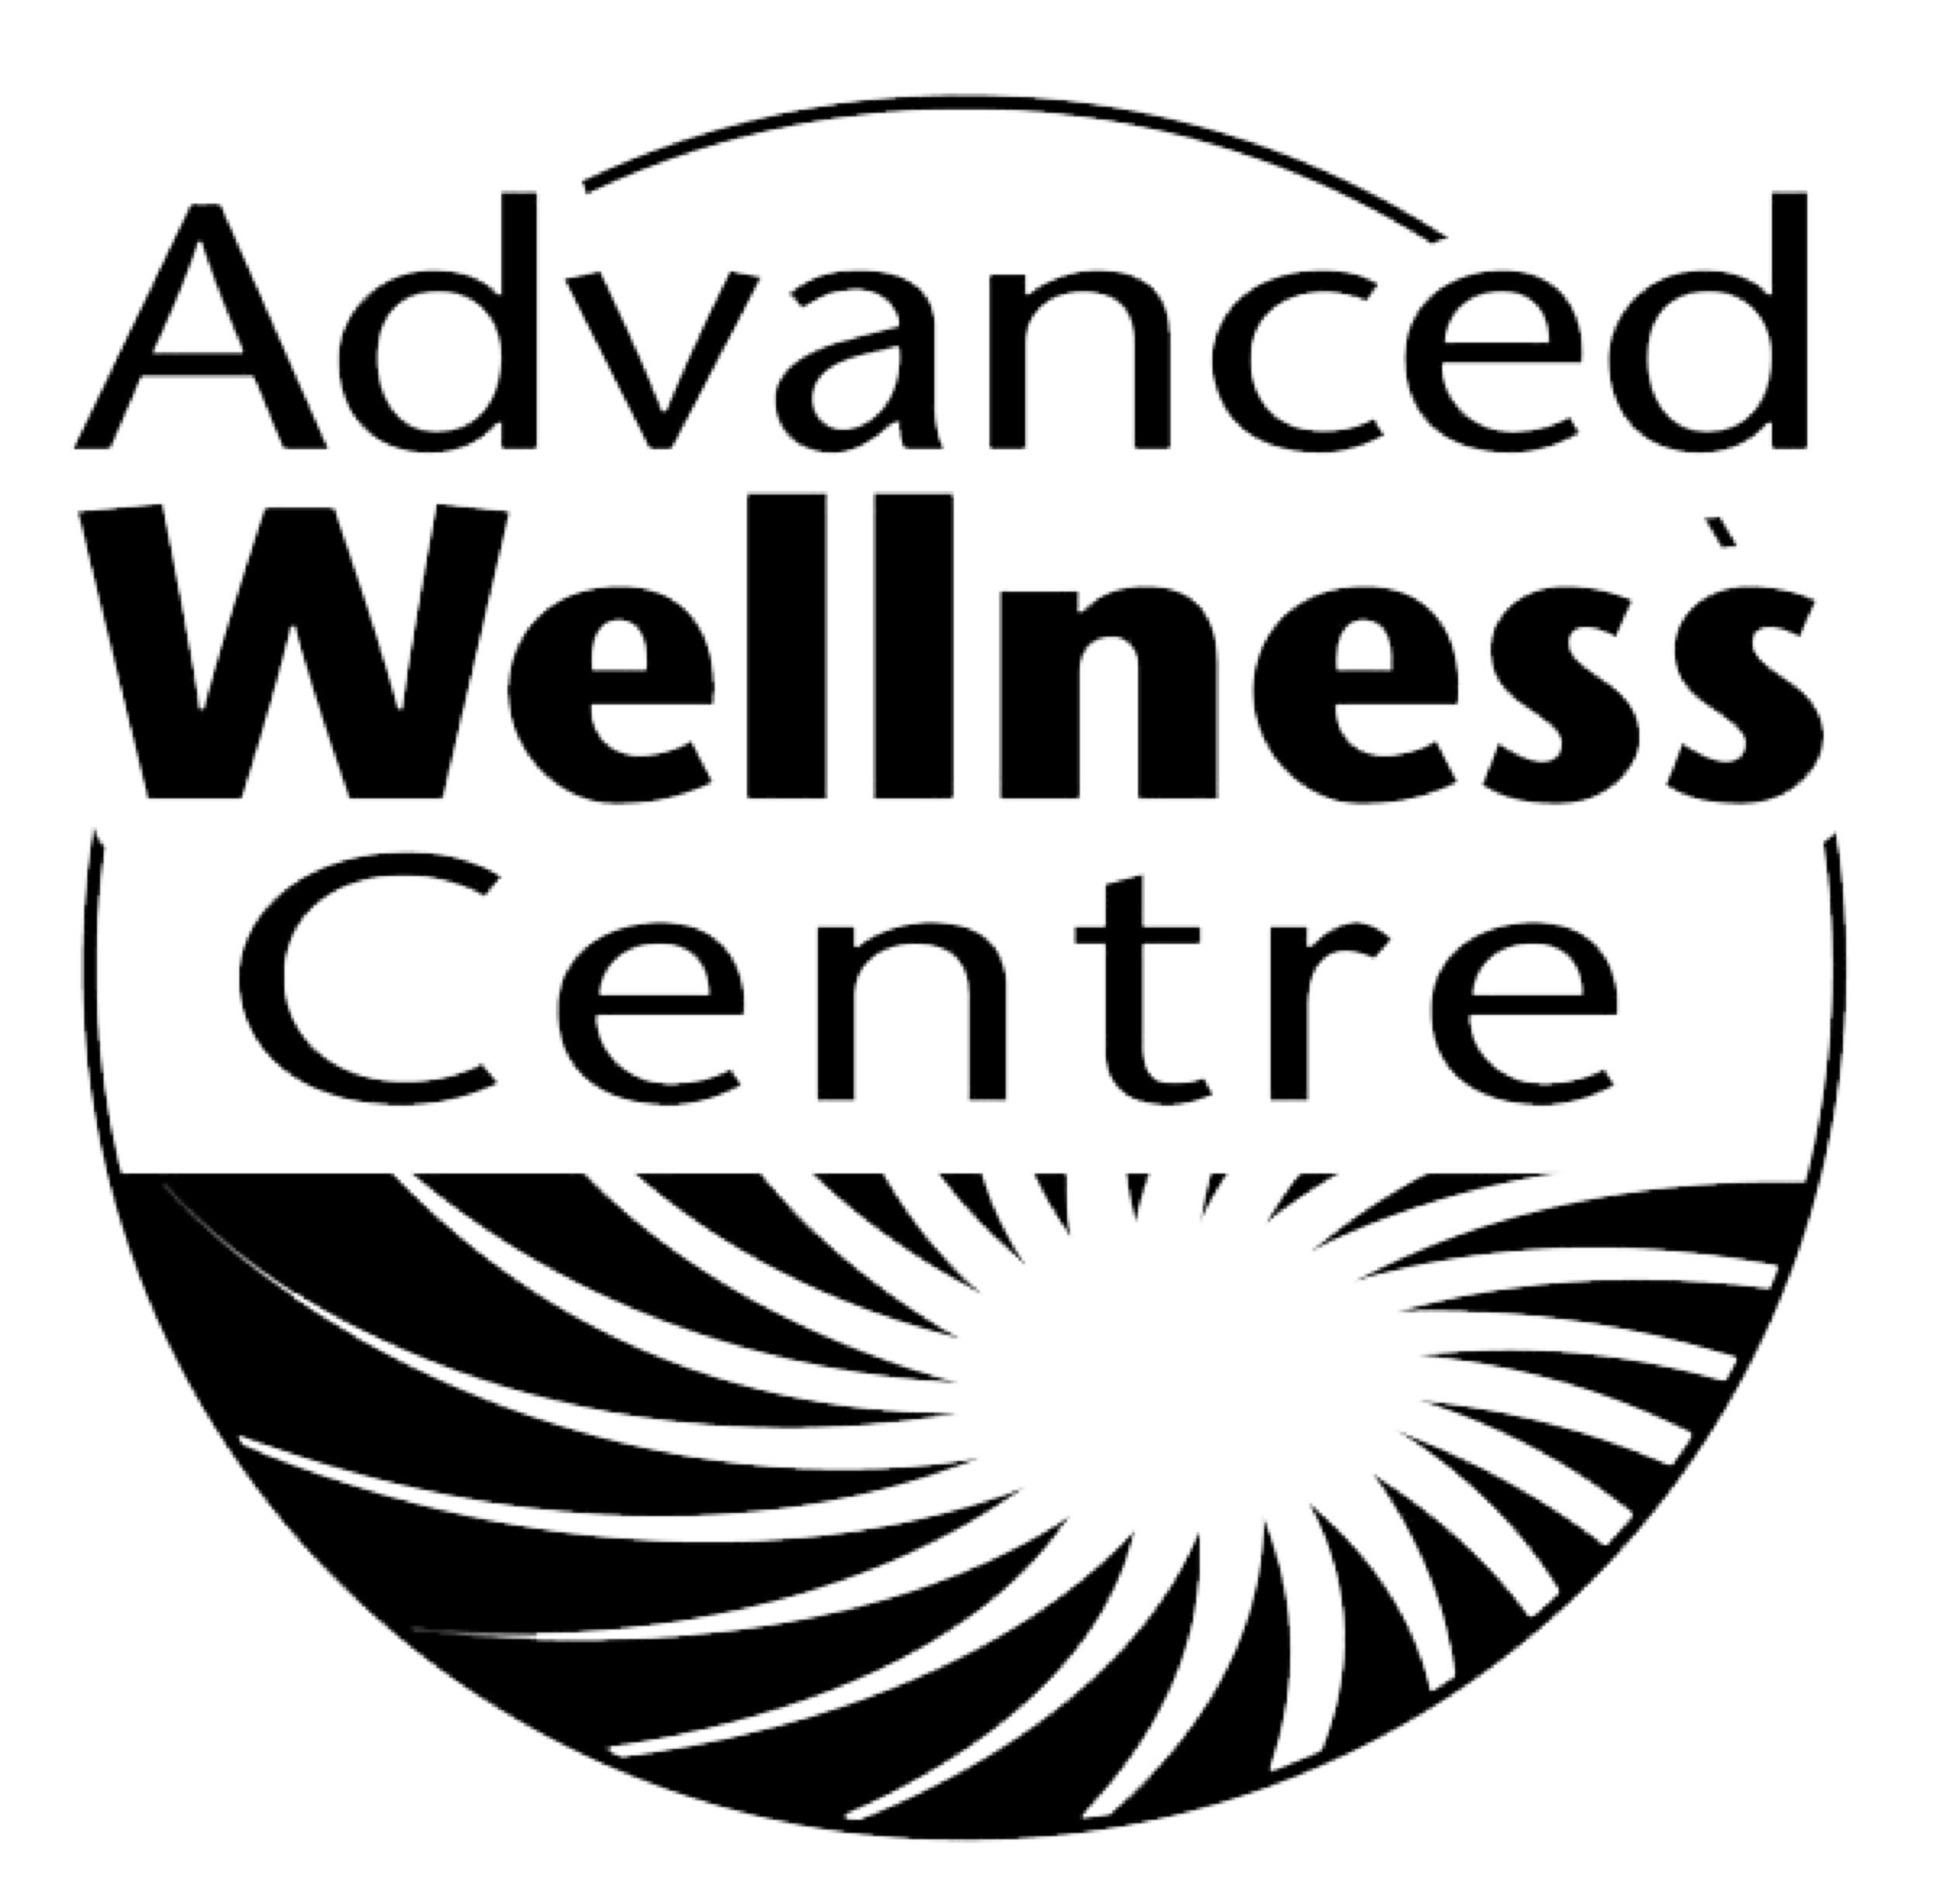 advancedwellnesscenter